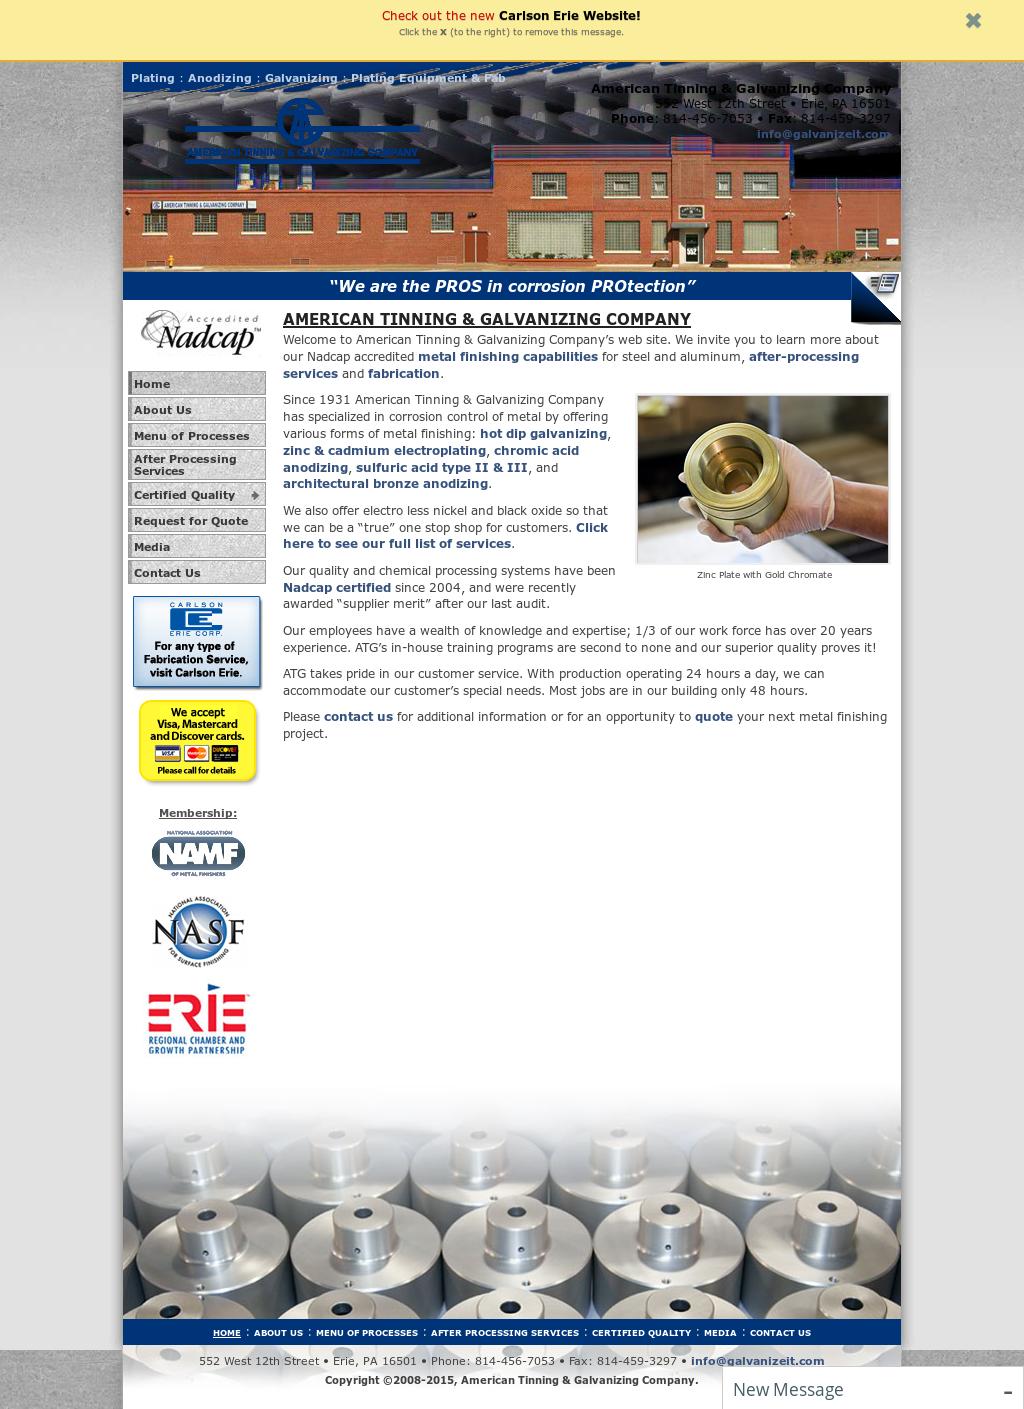 American Tinning & Galvanizing Competitors, Revenue and